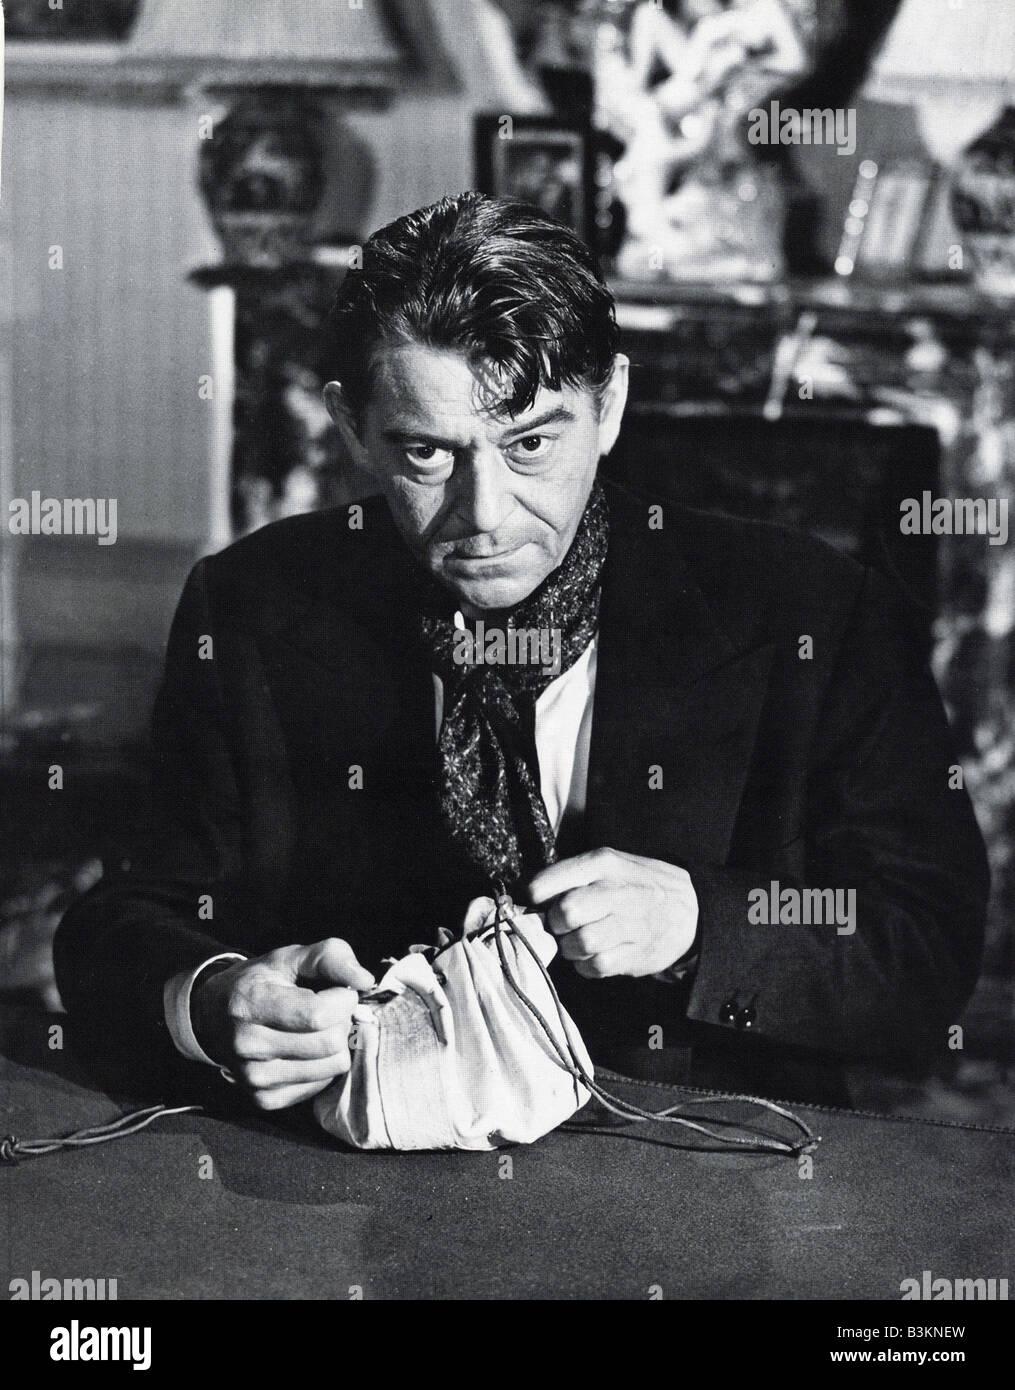 RIFIFI 1955 Indus/Pathe/Prima film with Jean Servais